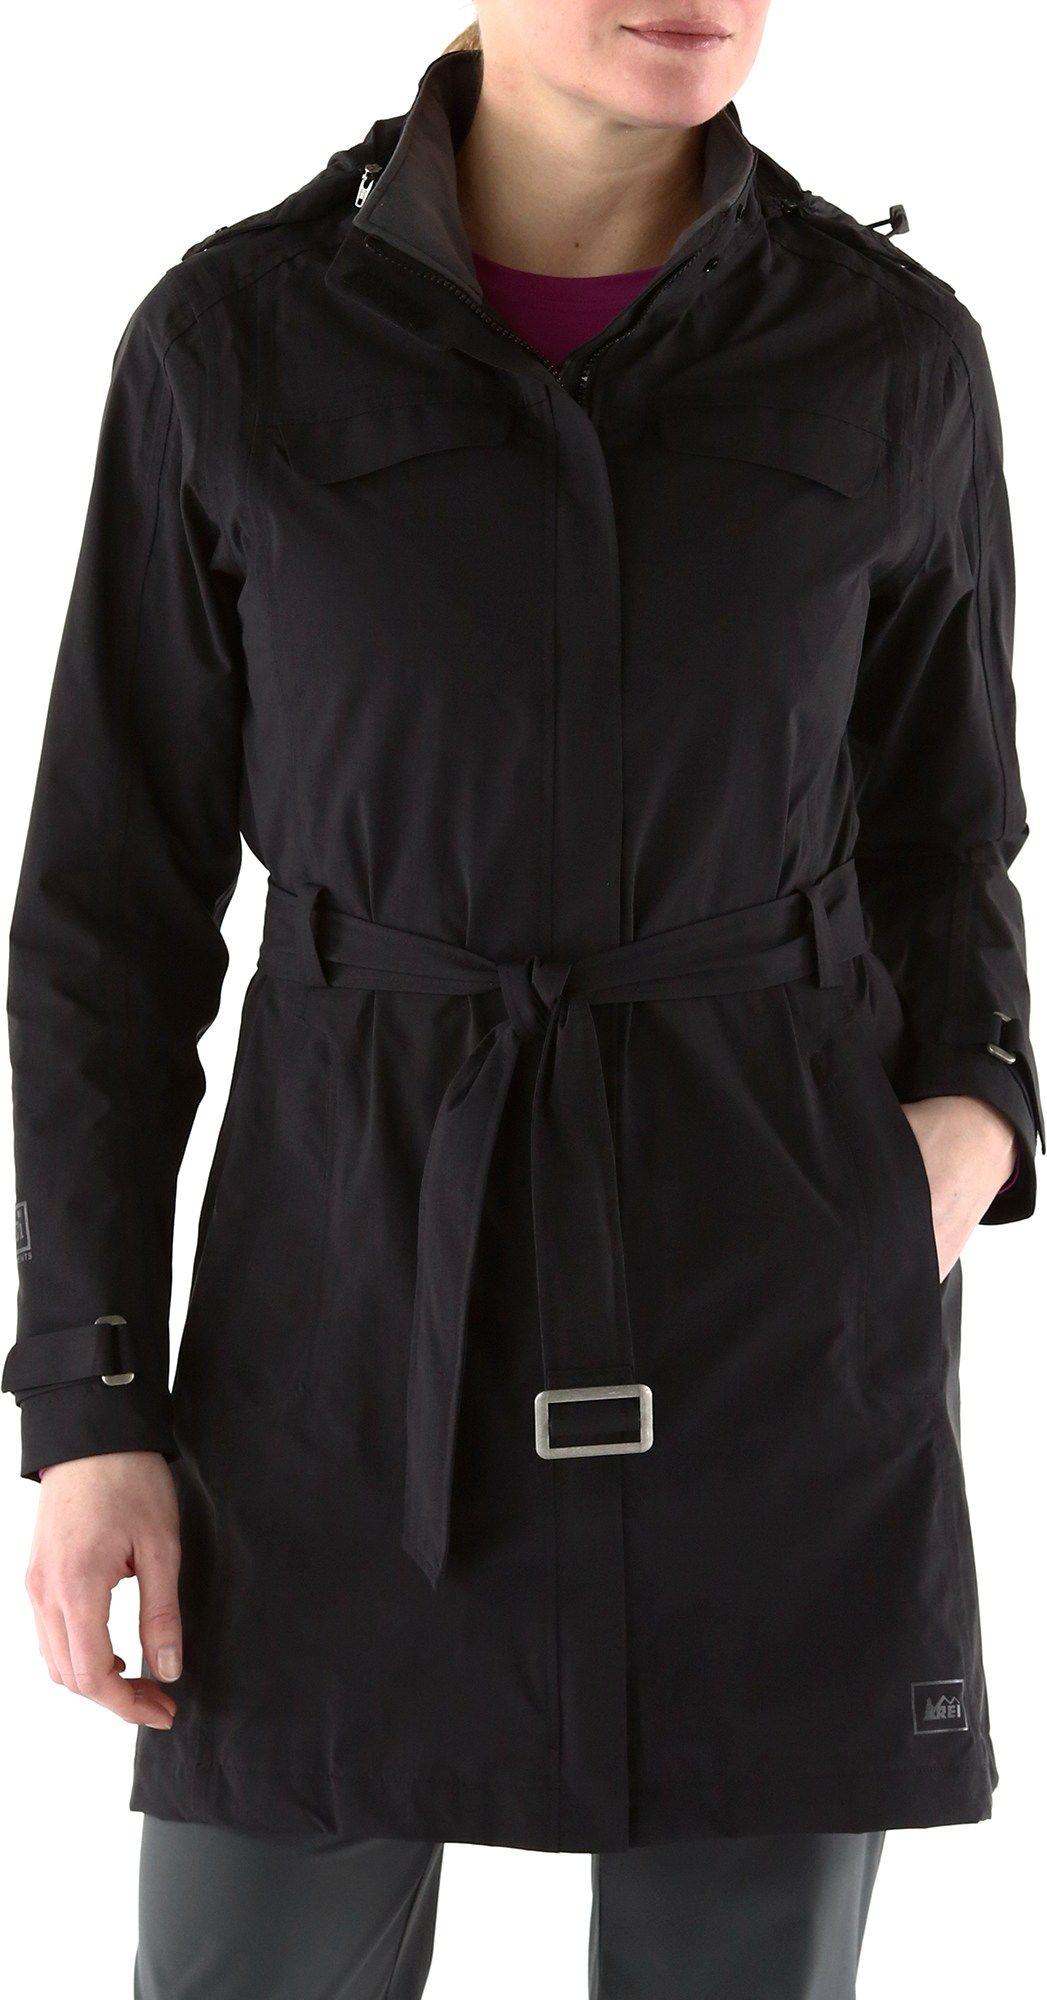 393bcfc99 REI La Selva Rain Jacket - Womens - Free Shipping at REI.com Thigh-length:  Back length 34 in. $169.00